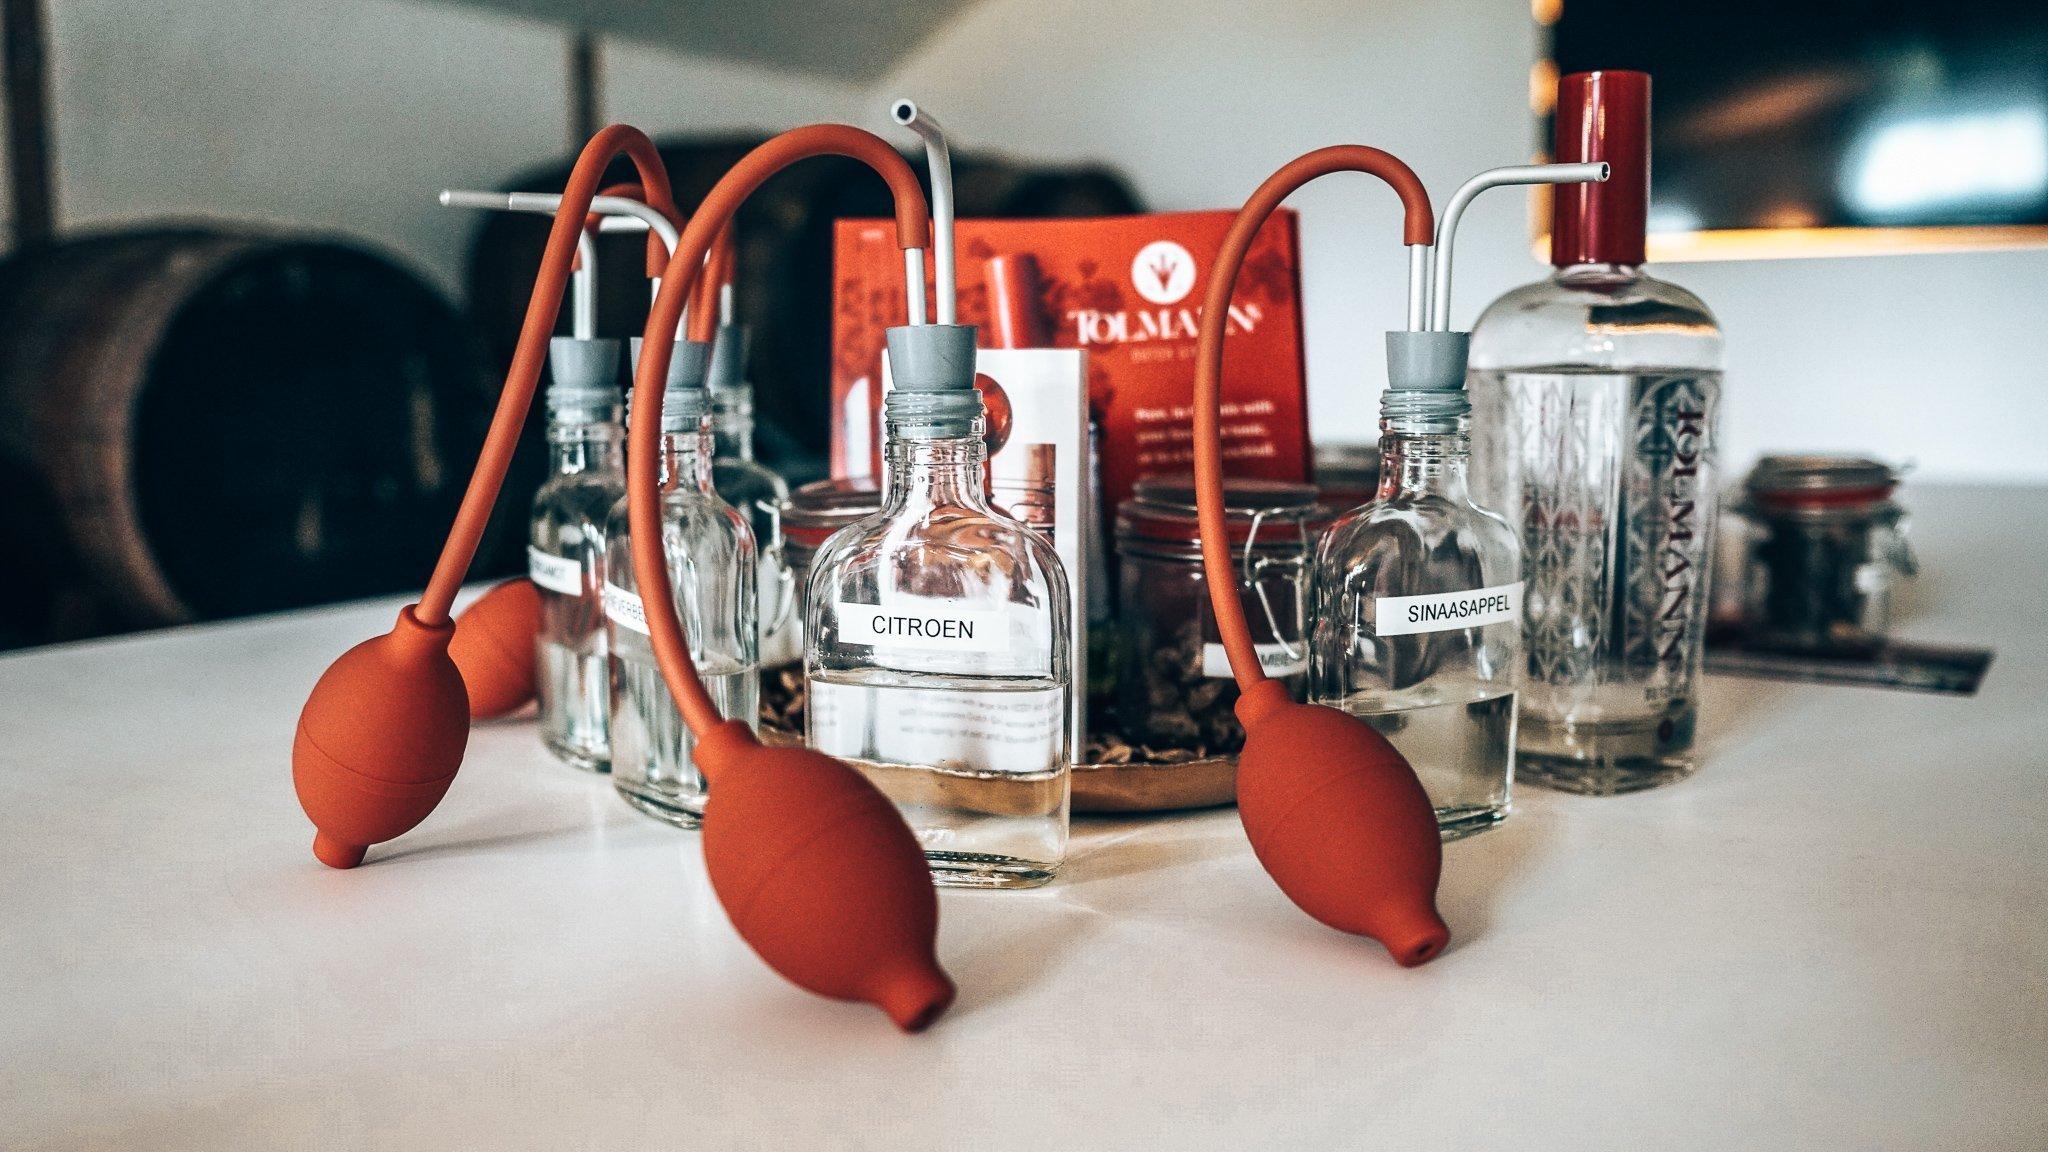 Ontwikkeling Tolmann's Dutch Gin, Tolmann's Distillery, Alles over gin.